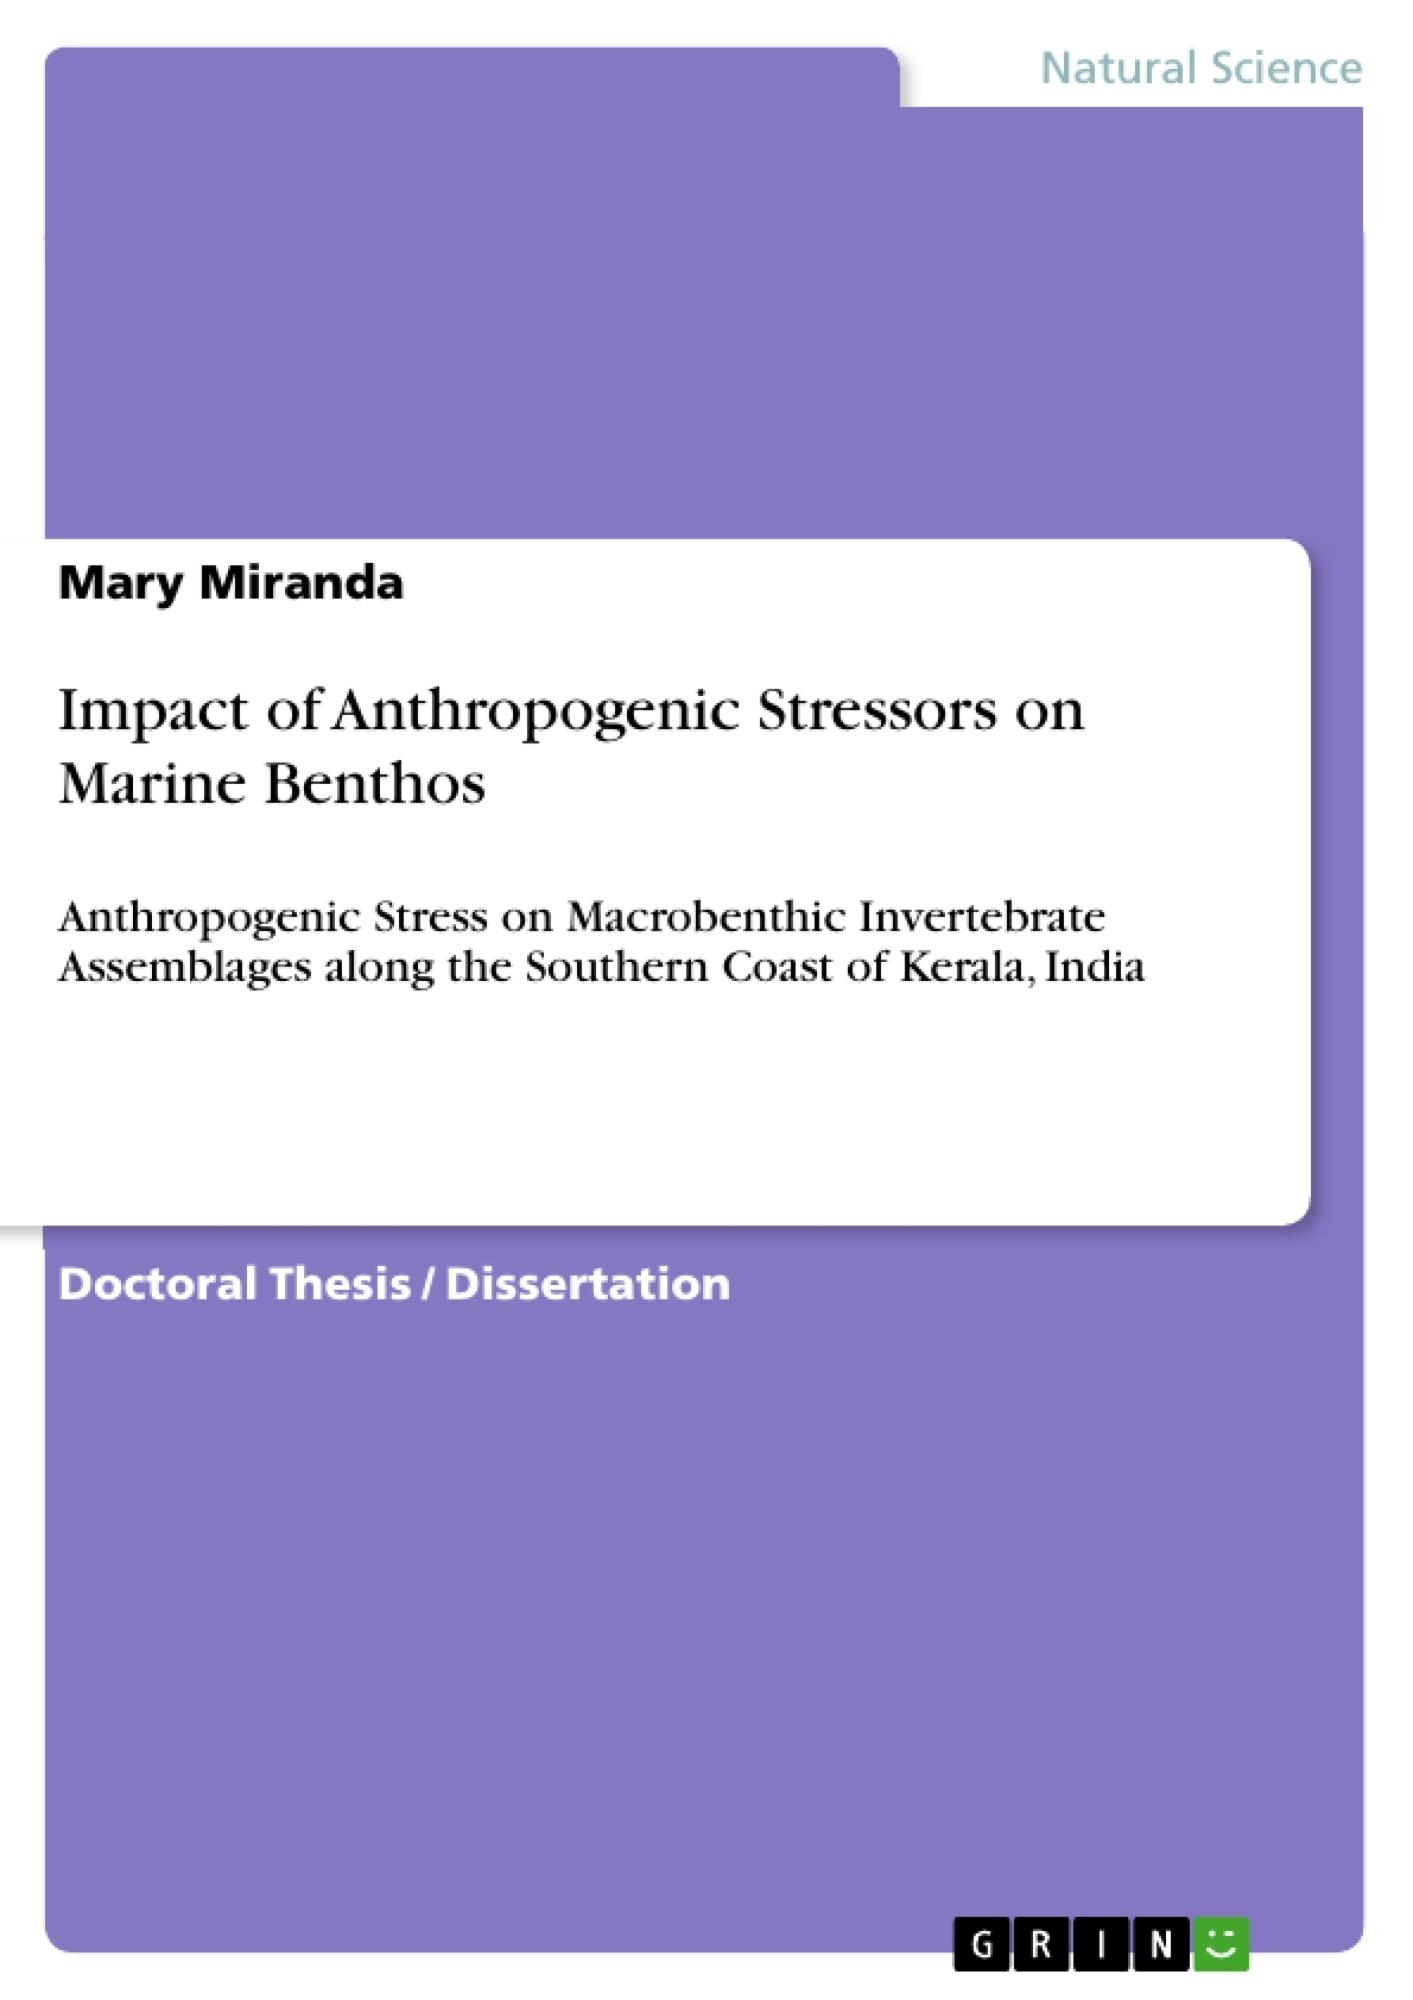 Title: Impact of Anthropogenic Stressors on Marine Benthos